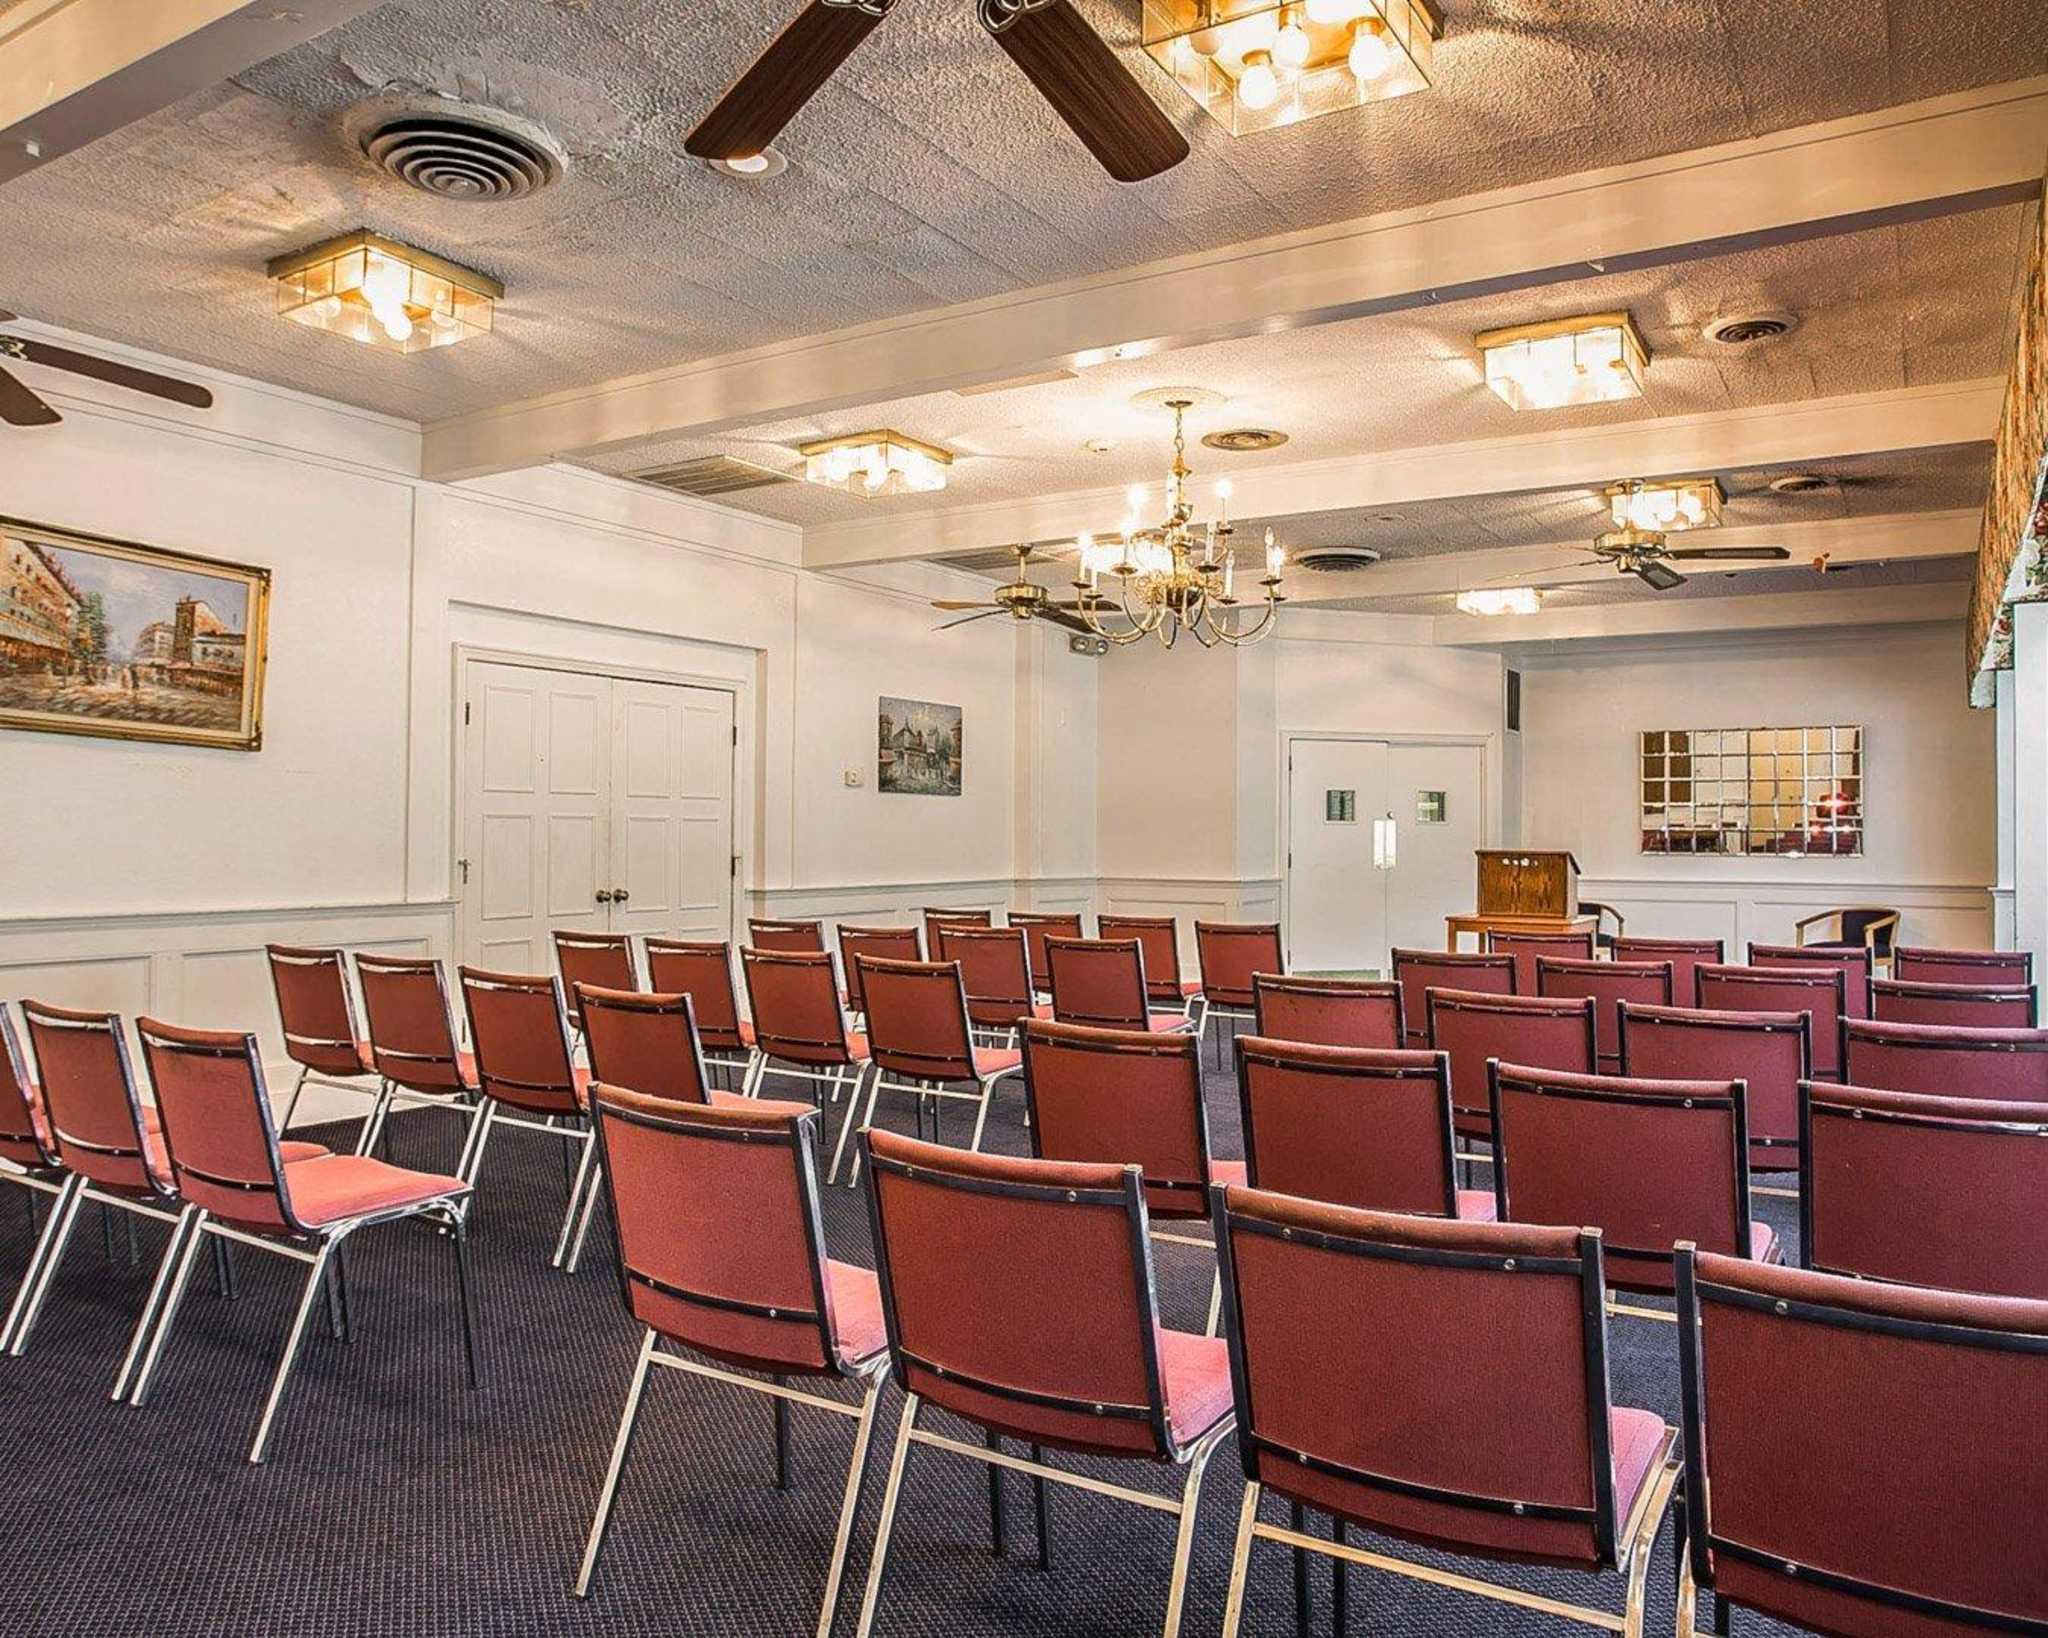 Hotel Rooms In Sumter Sc